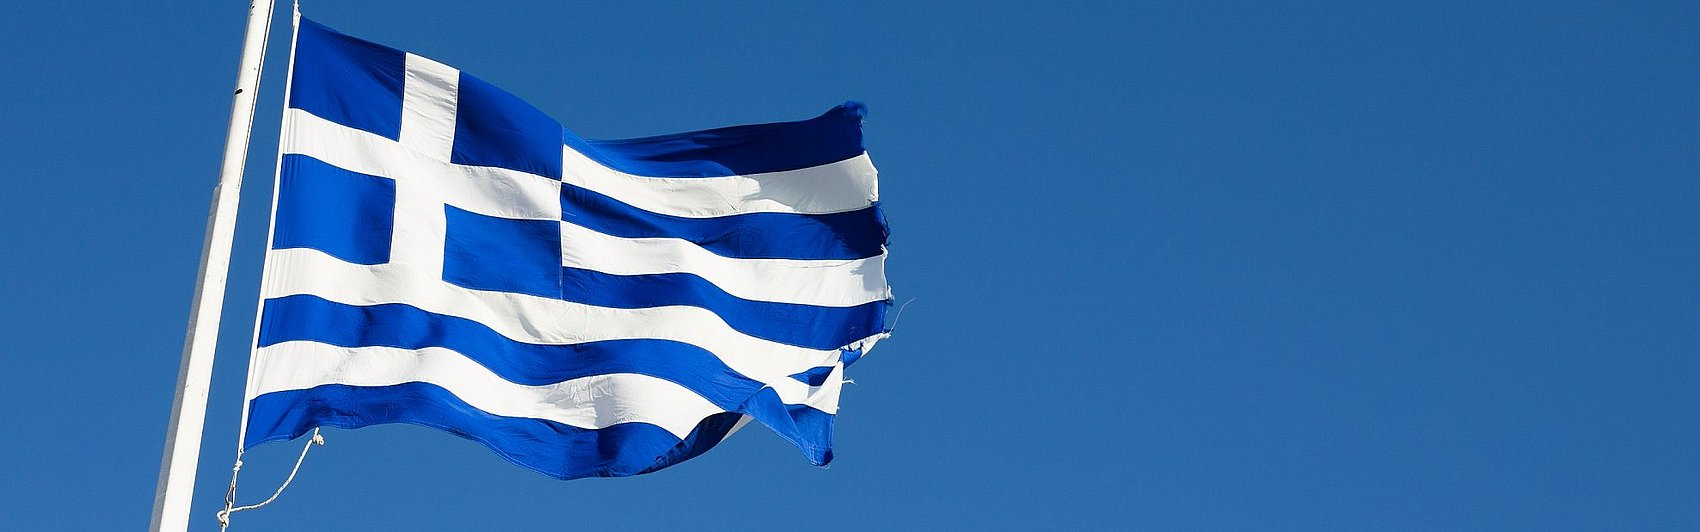 csm_Greece__002__38ad2167f3.jpg